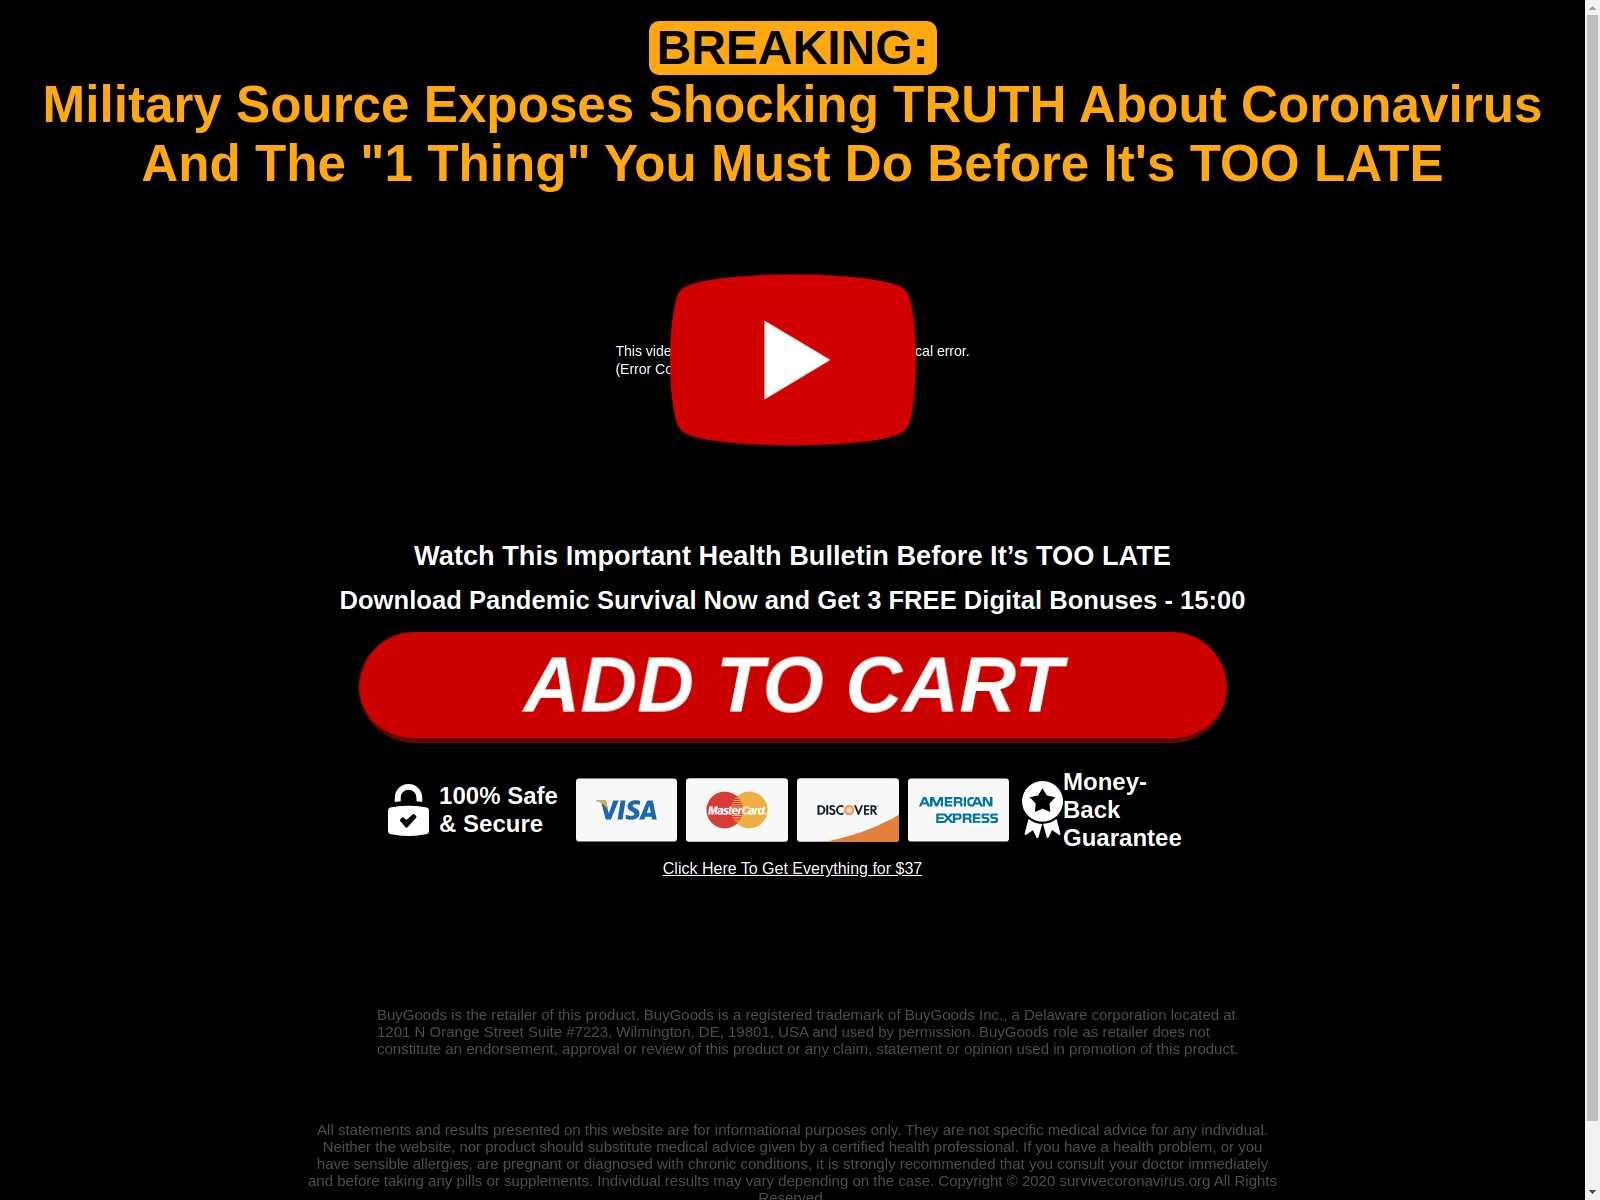 coronavirus scam scaring users